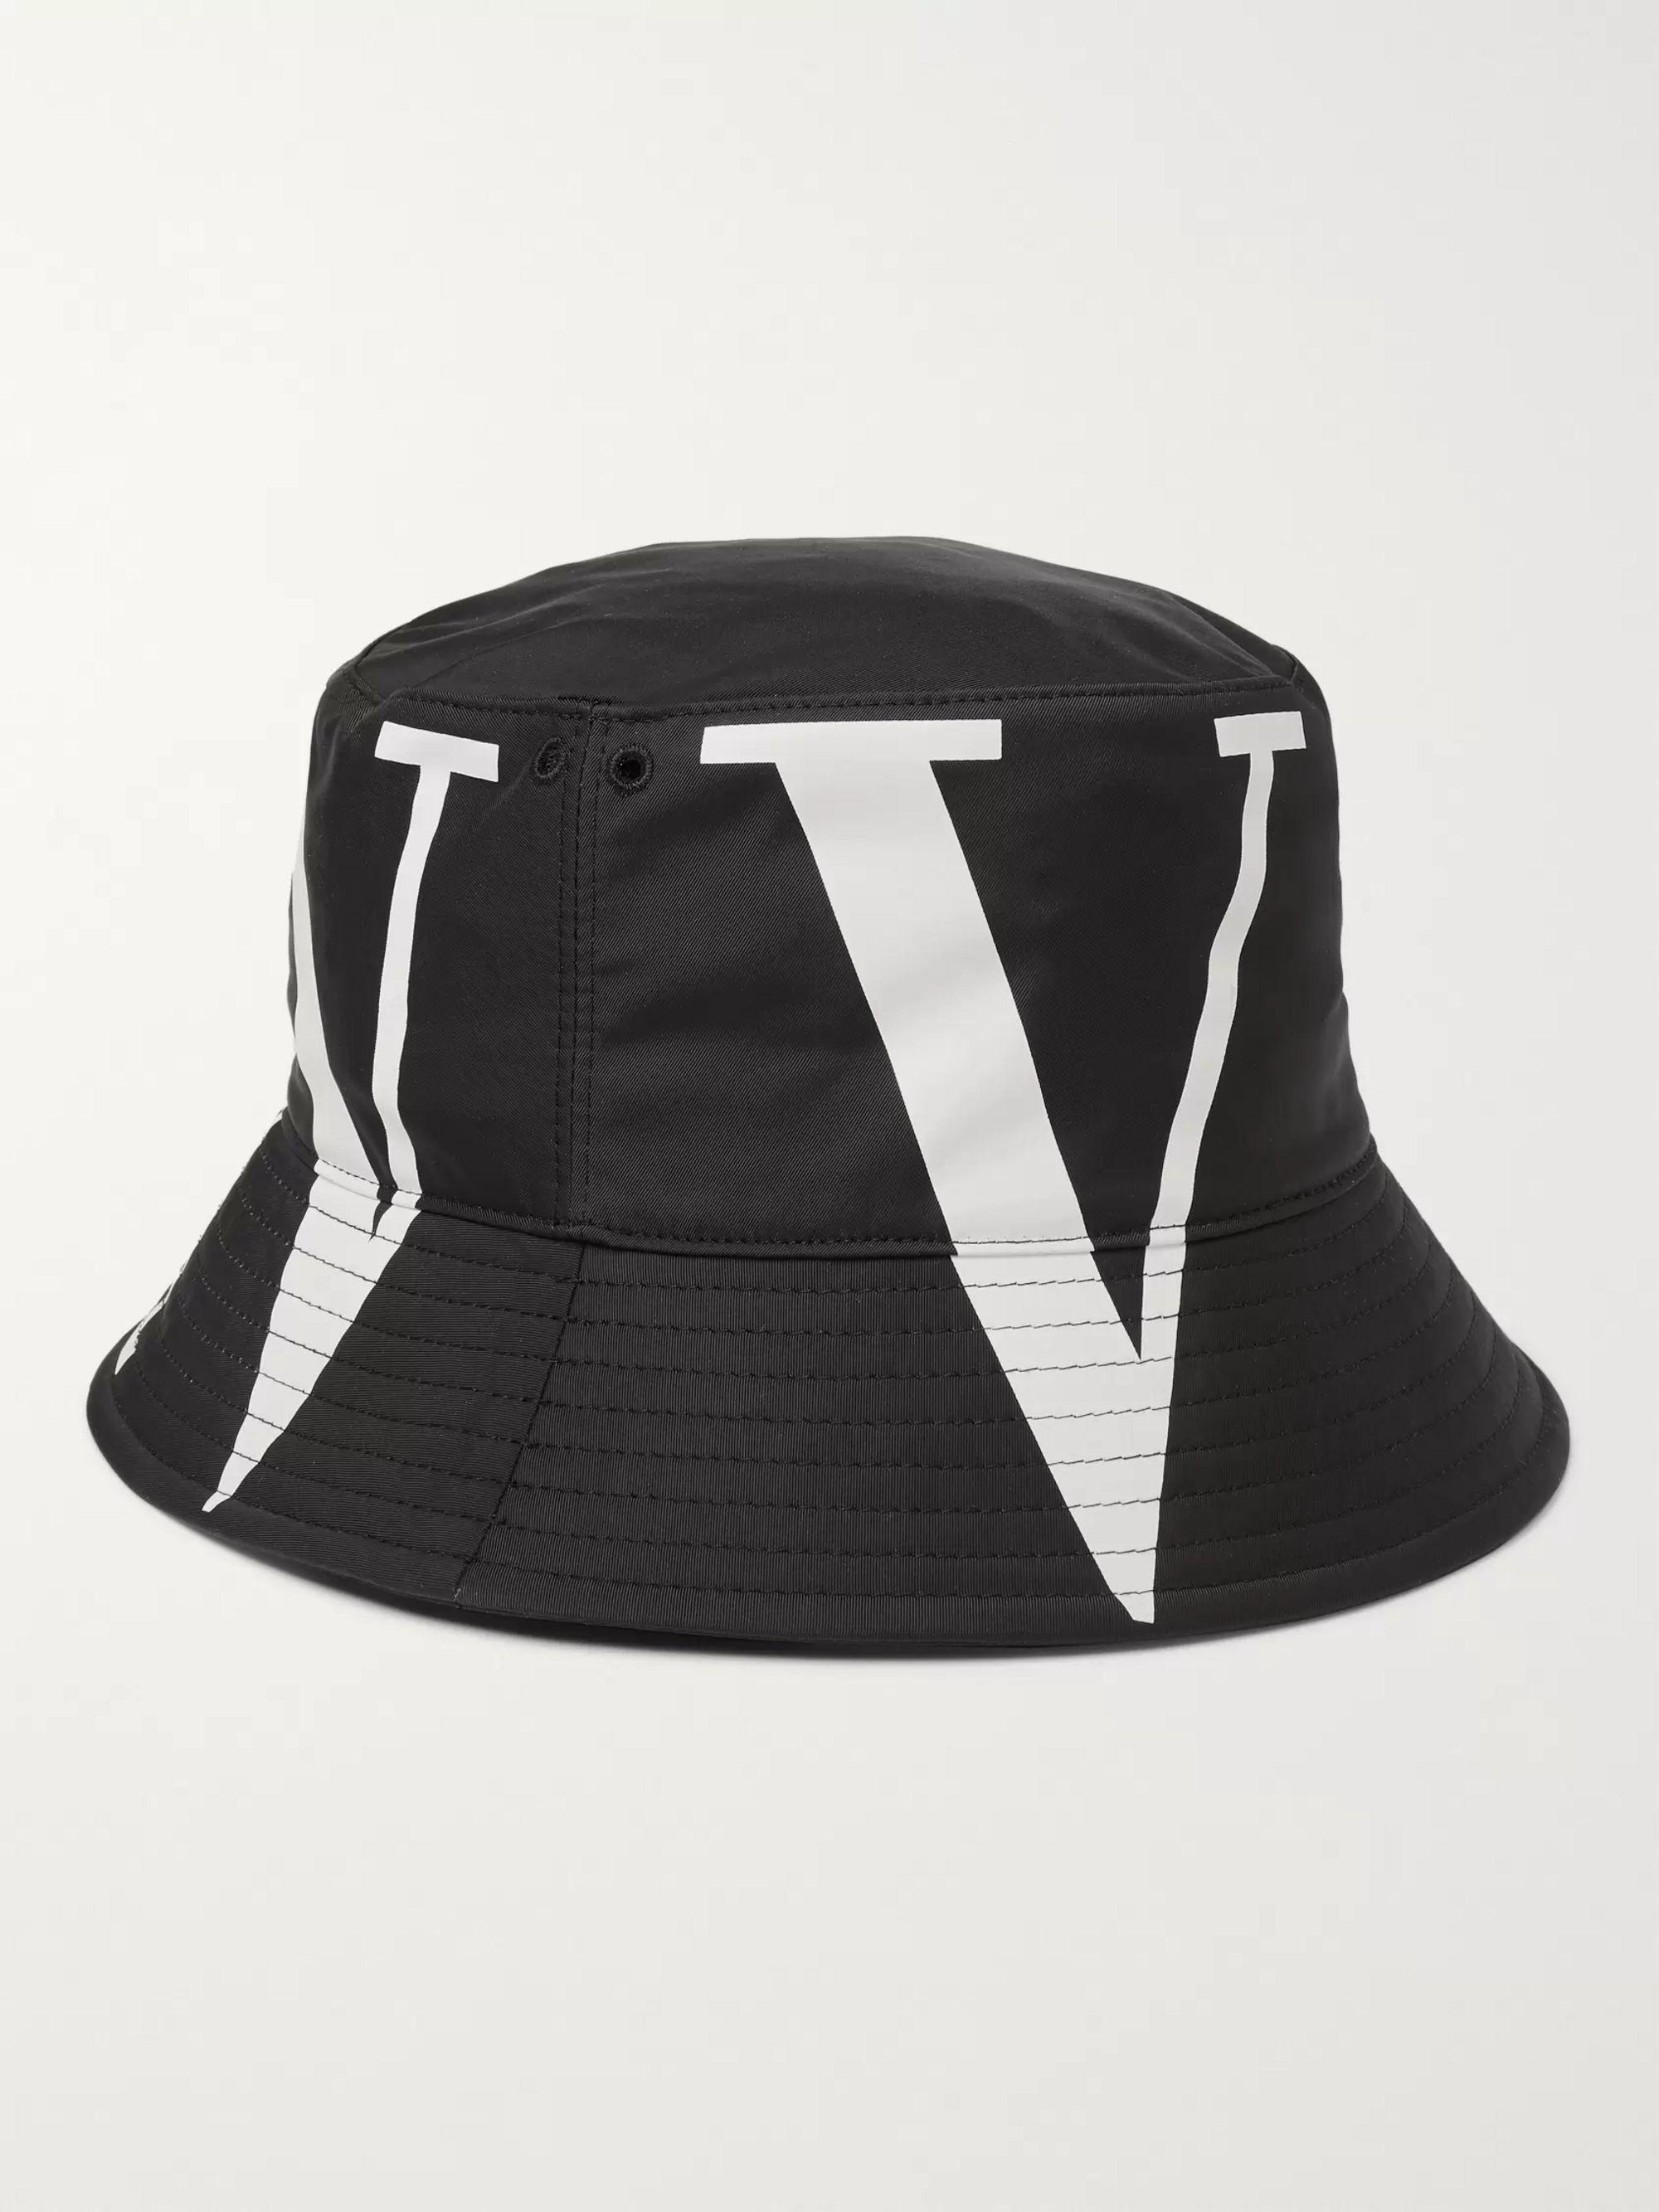 bedst 100% top kvalitet flere billeder Valentino Garavani Logo-Print Canvas Bucket Hat